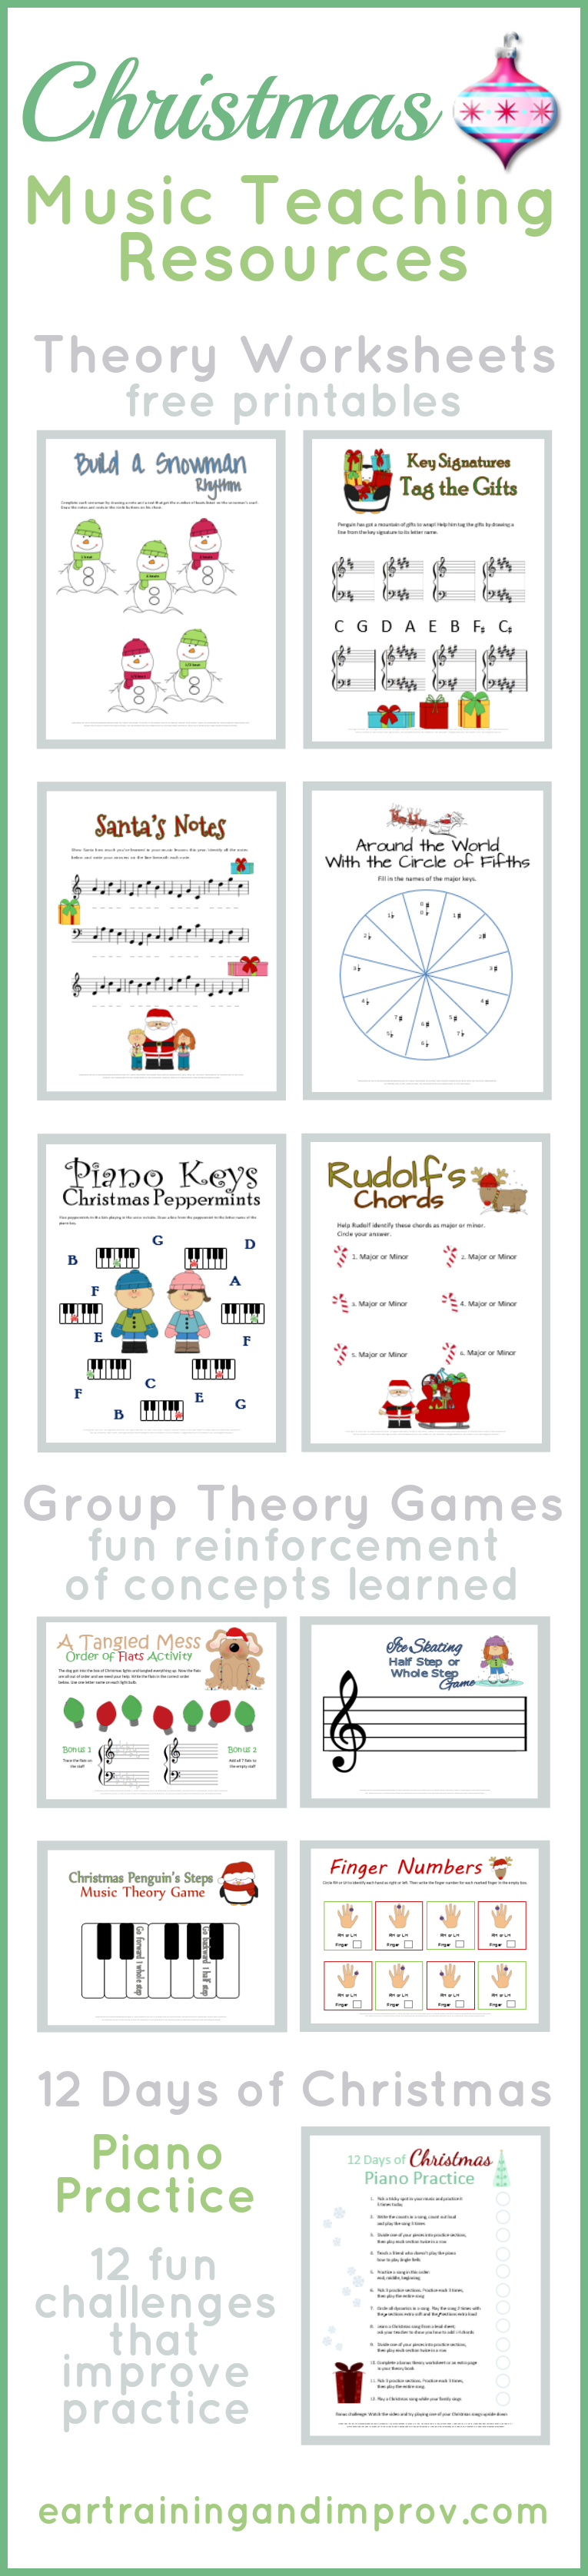 Christmas Music Theory Worksheets - 20+ Free Printables - Free Printable Group Games